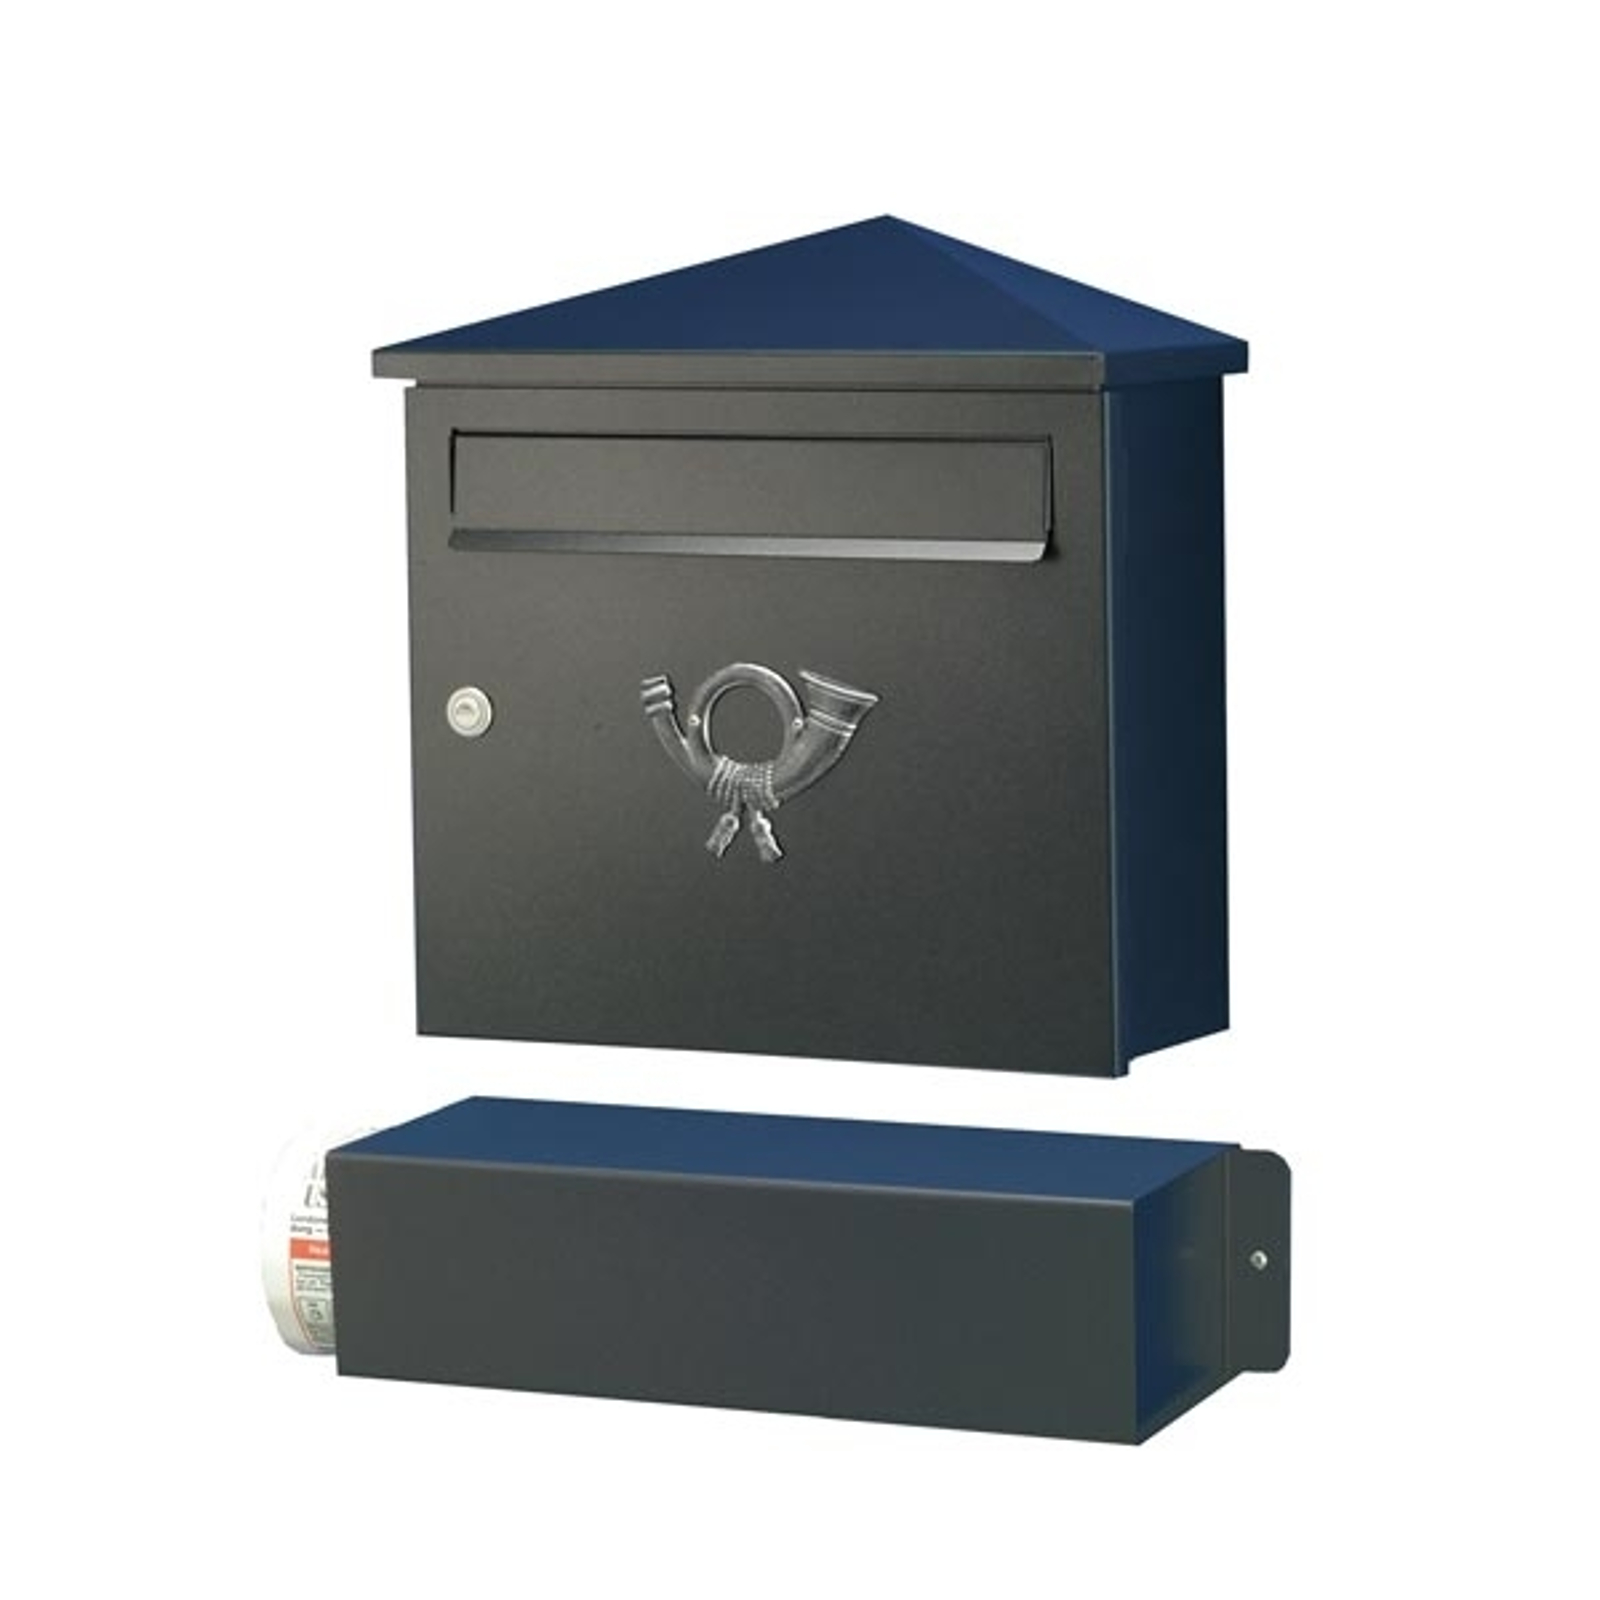 Eleganet LUCIO postkasse i svart